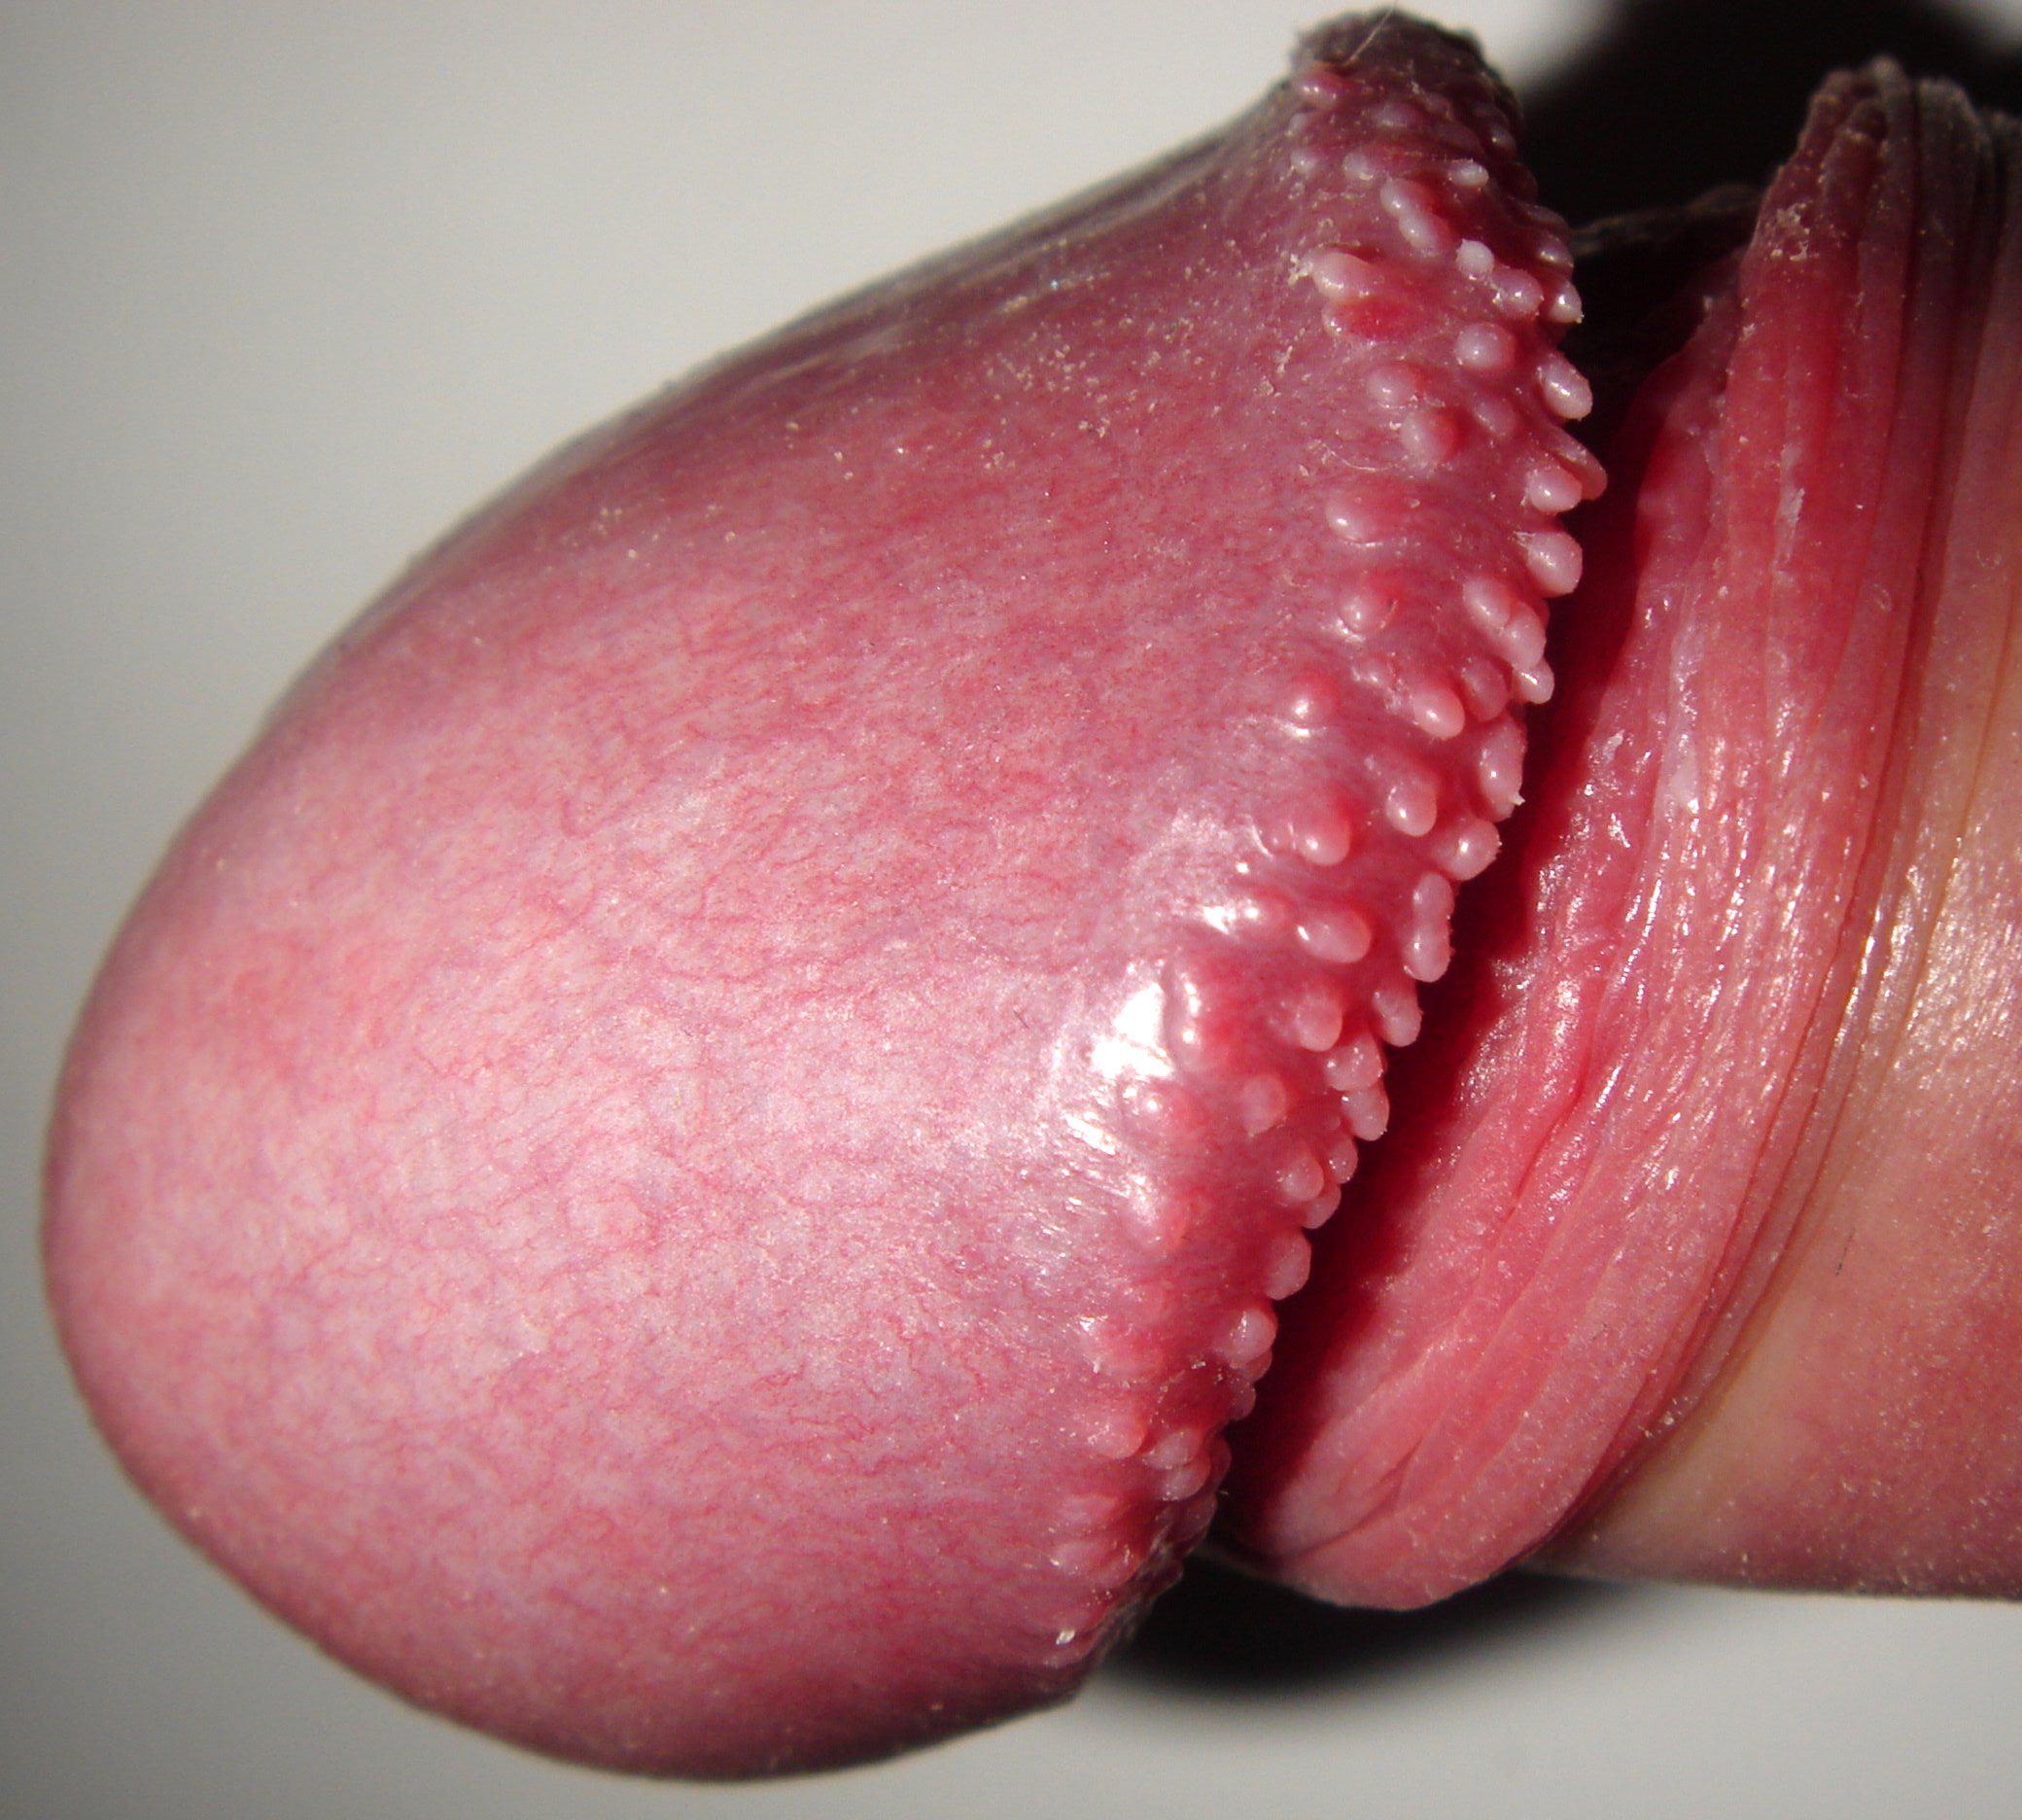 vestibular papillomatosis definition ciuperci de post